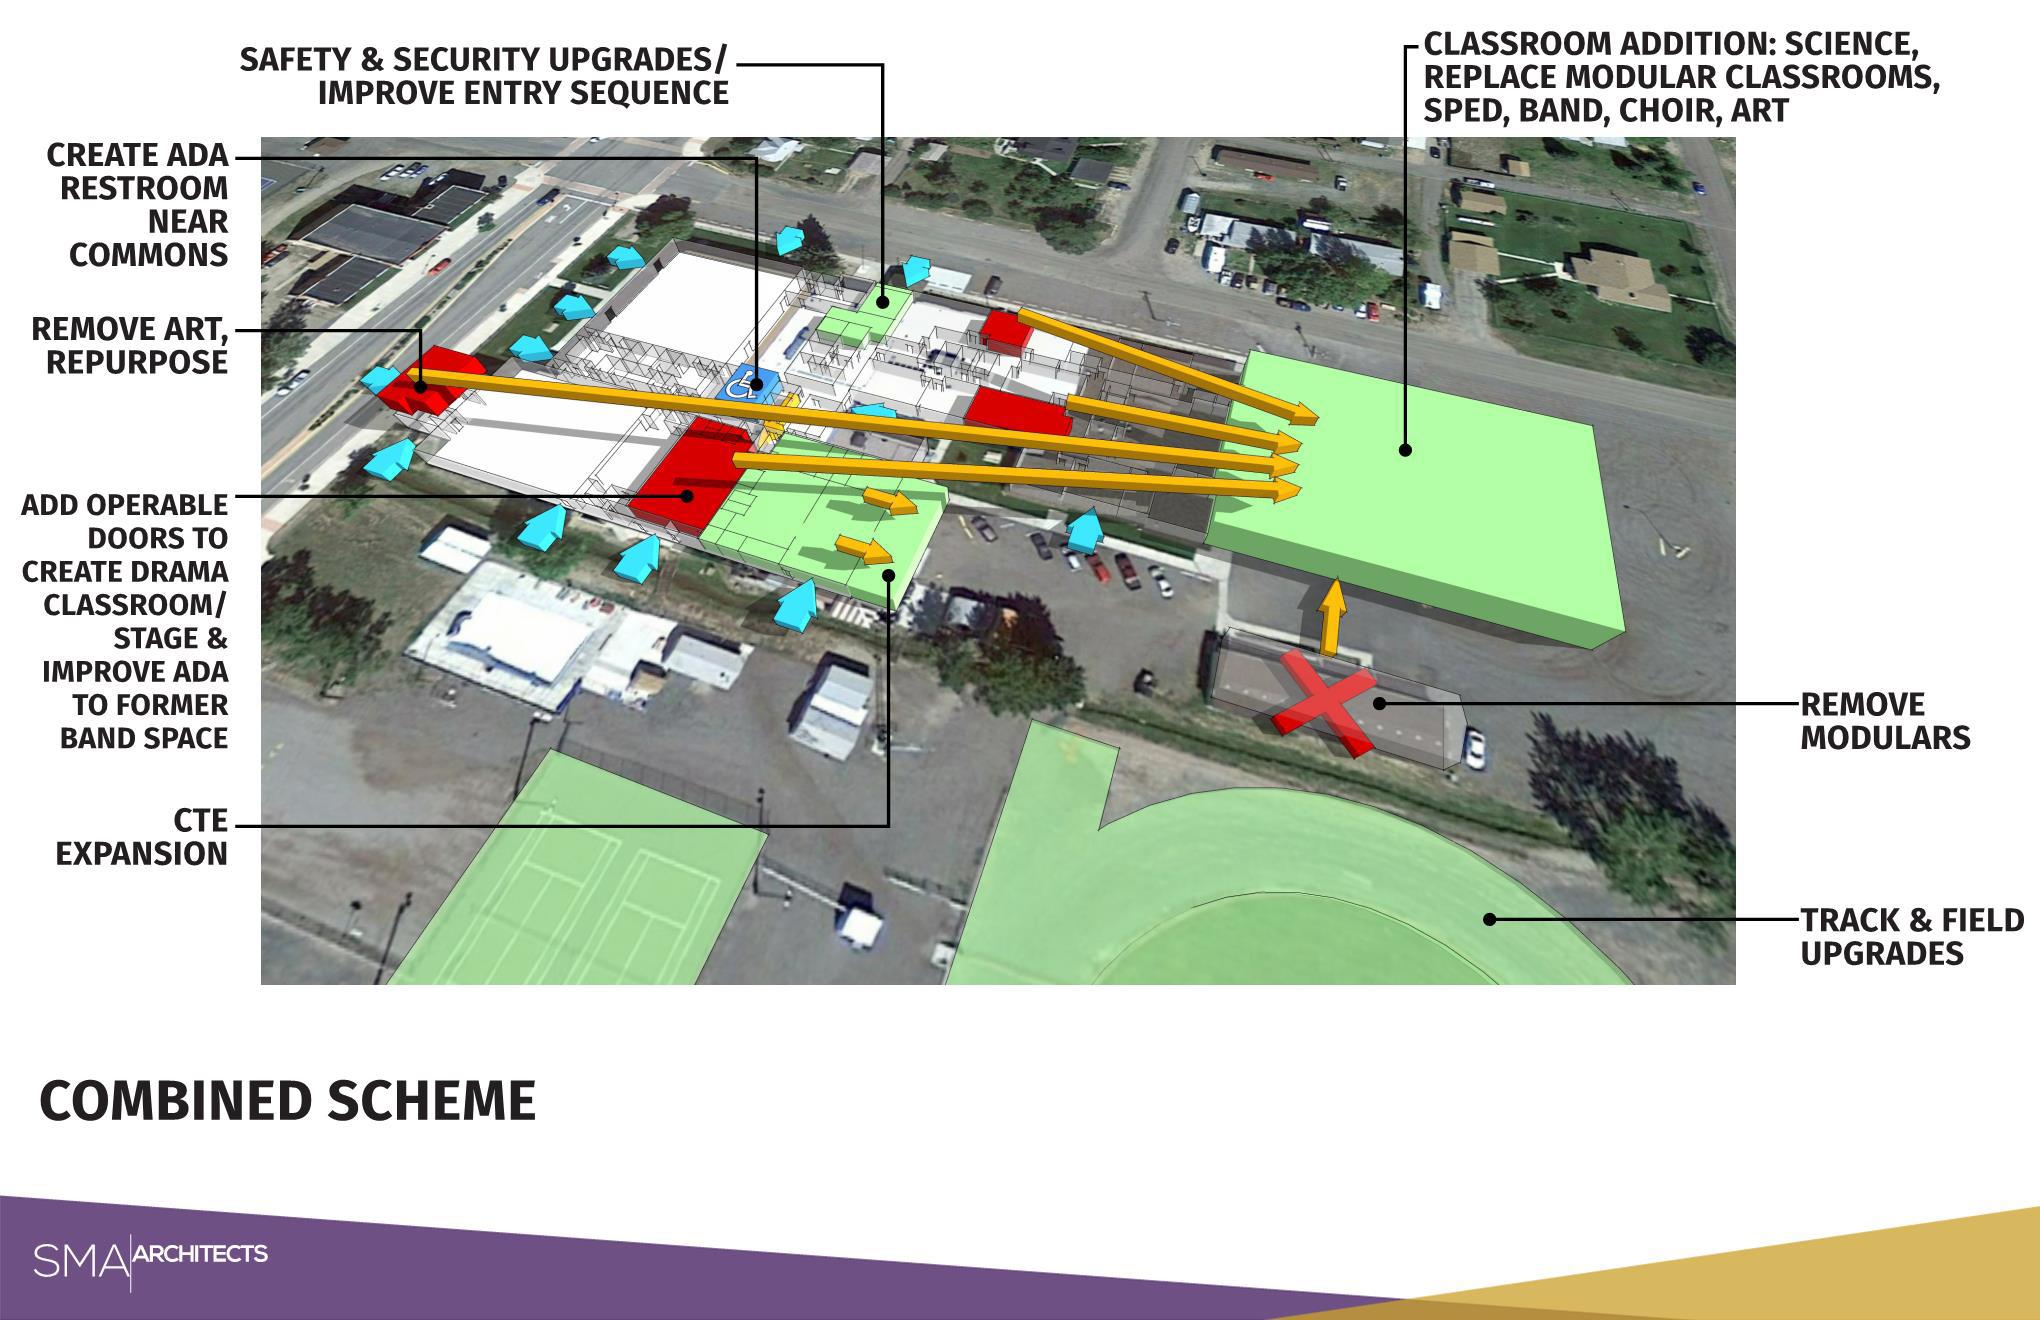 Presentation slide depicting potential improvements to Jefferson High School